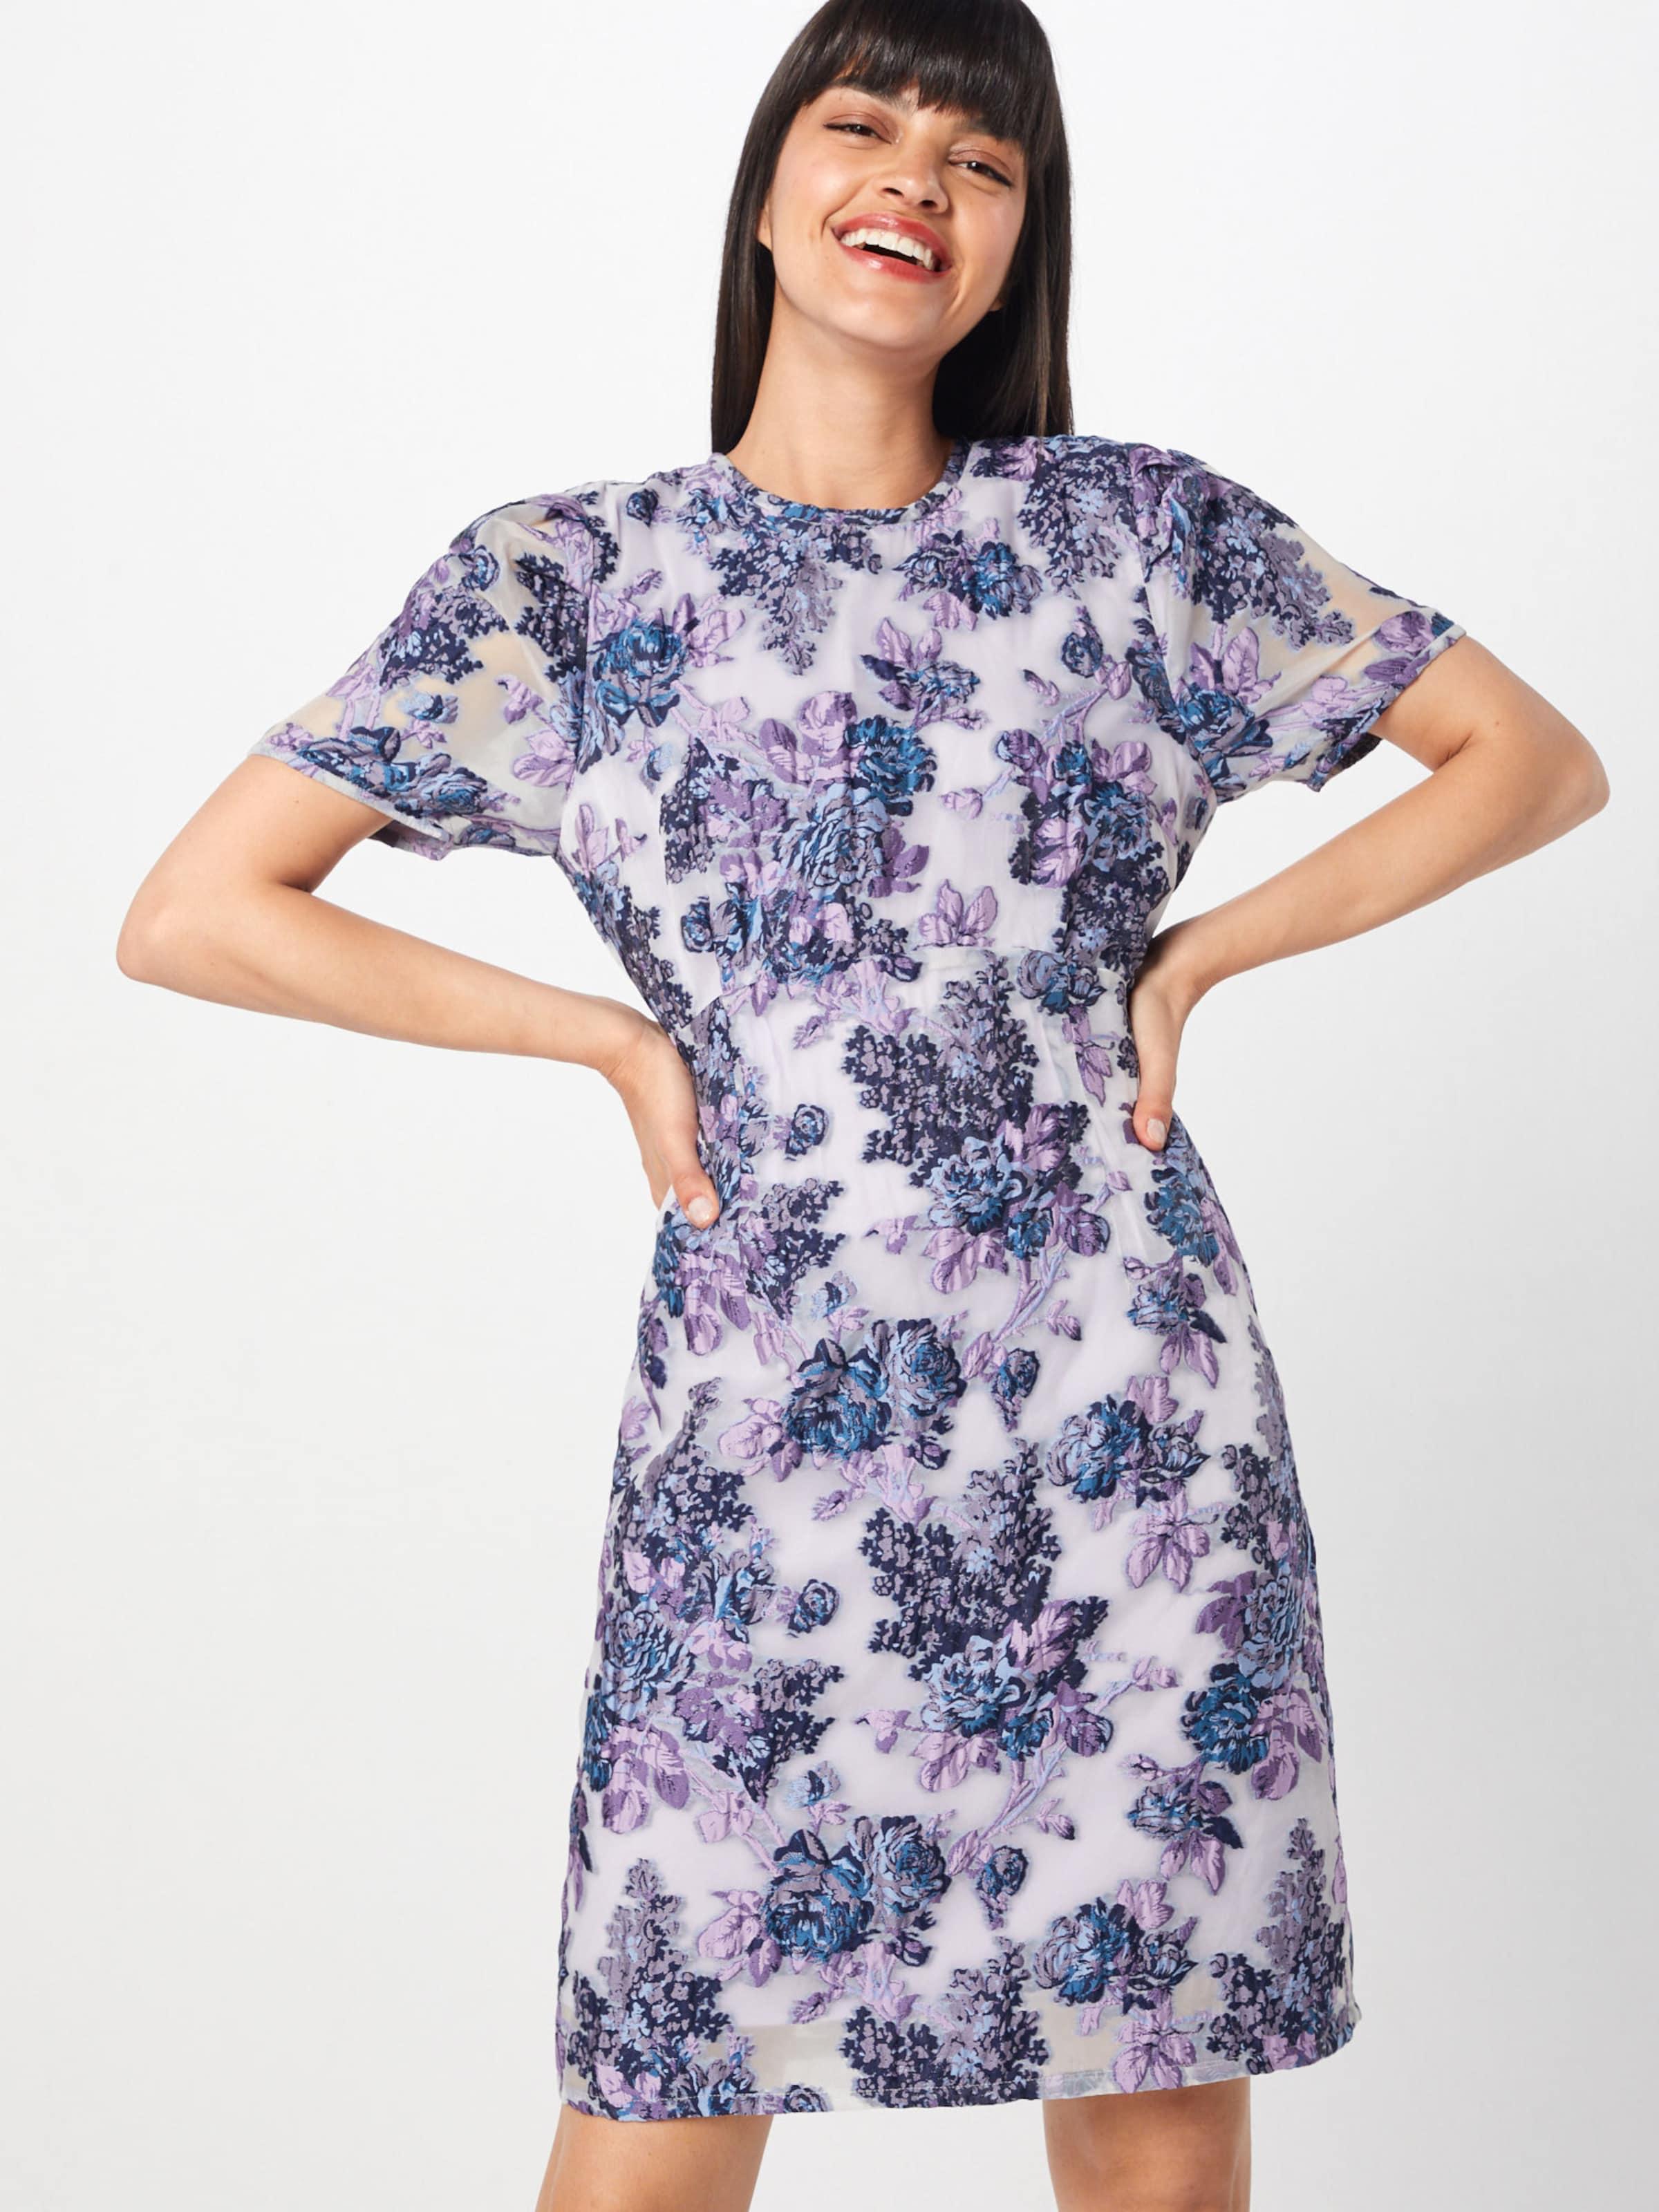 In 'possera' Postyr Kleid Postyr Kleid BlauLila 29EDHYWI